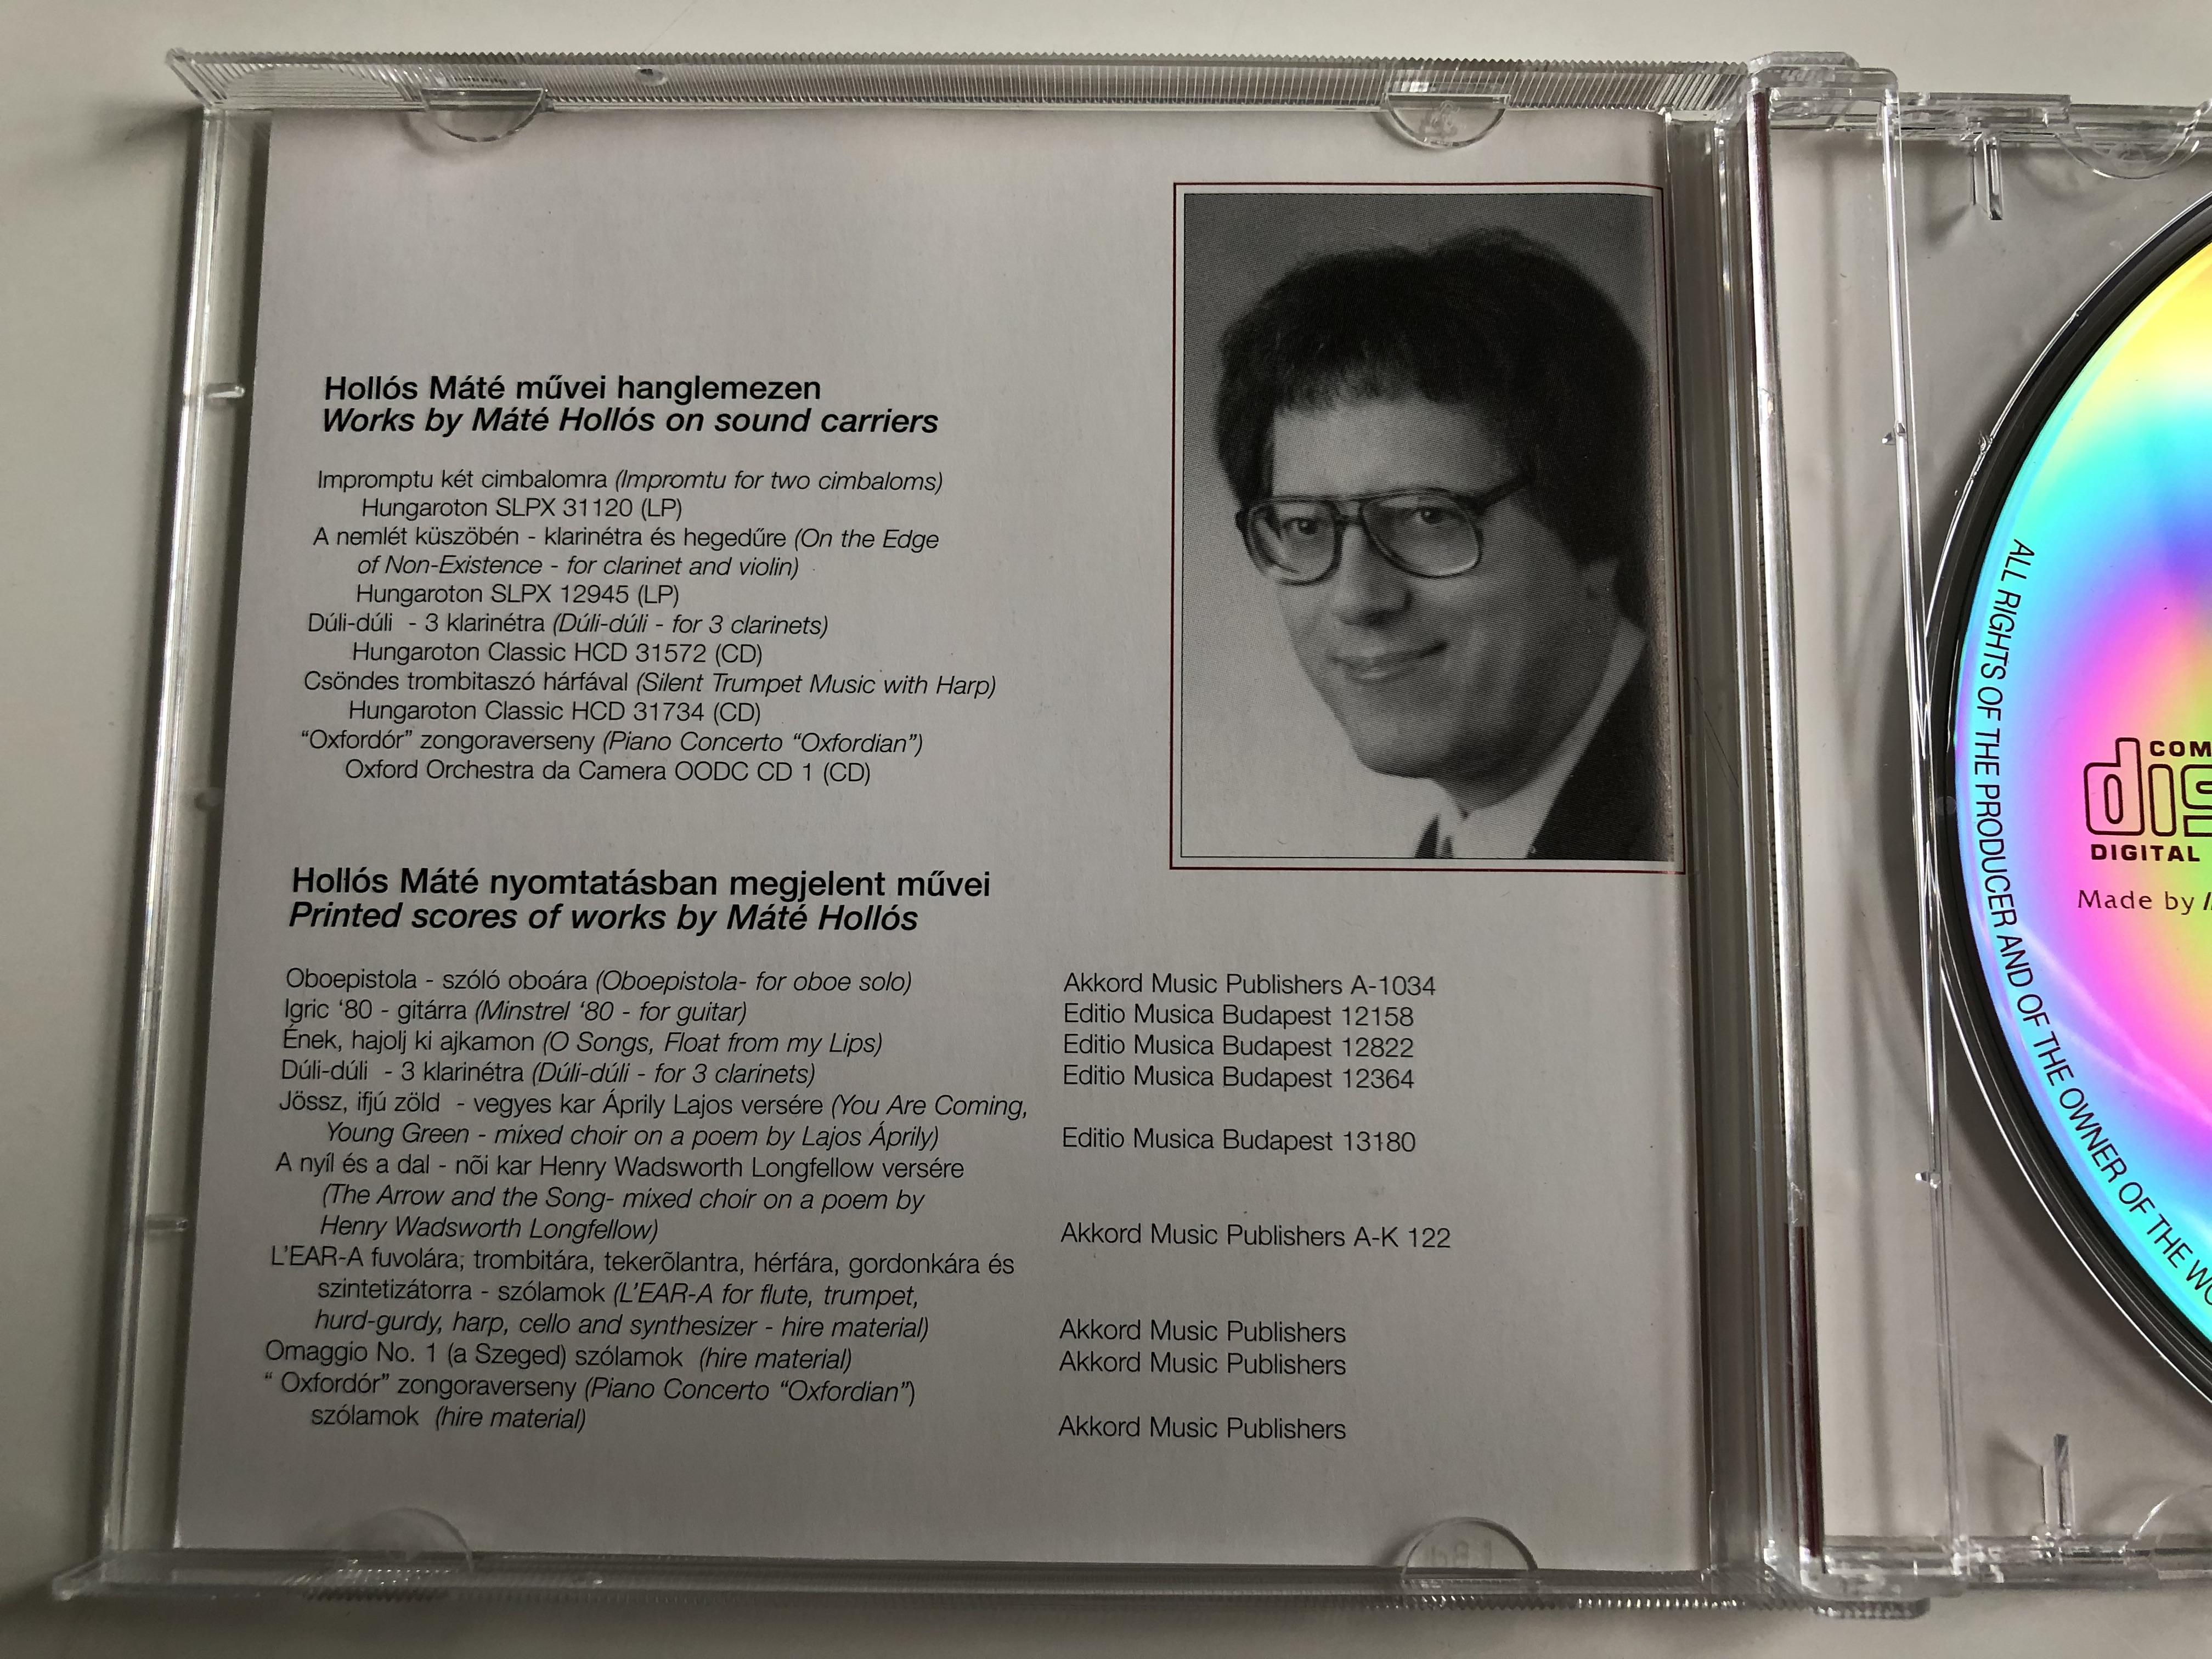 works-by-mate-hollos-folfele-hullo-levelek-eneke-leaves-falling-upwards-pannon-classic-audio-cd-1997-pcl-8006-4-.jpg